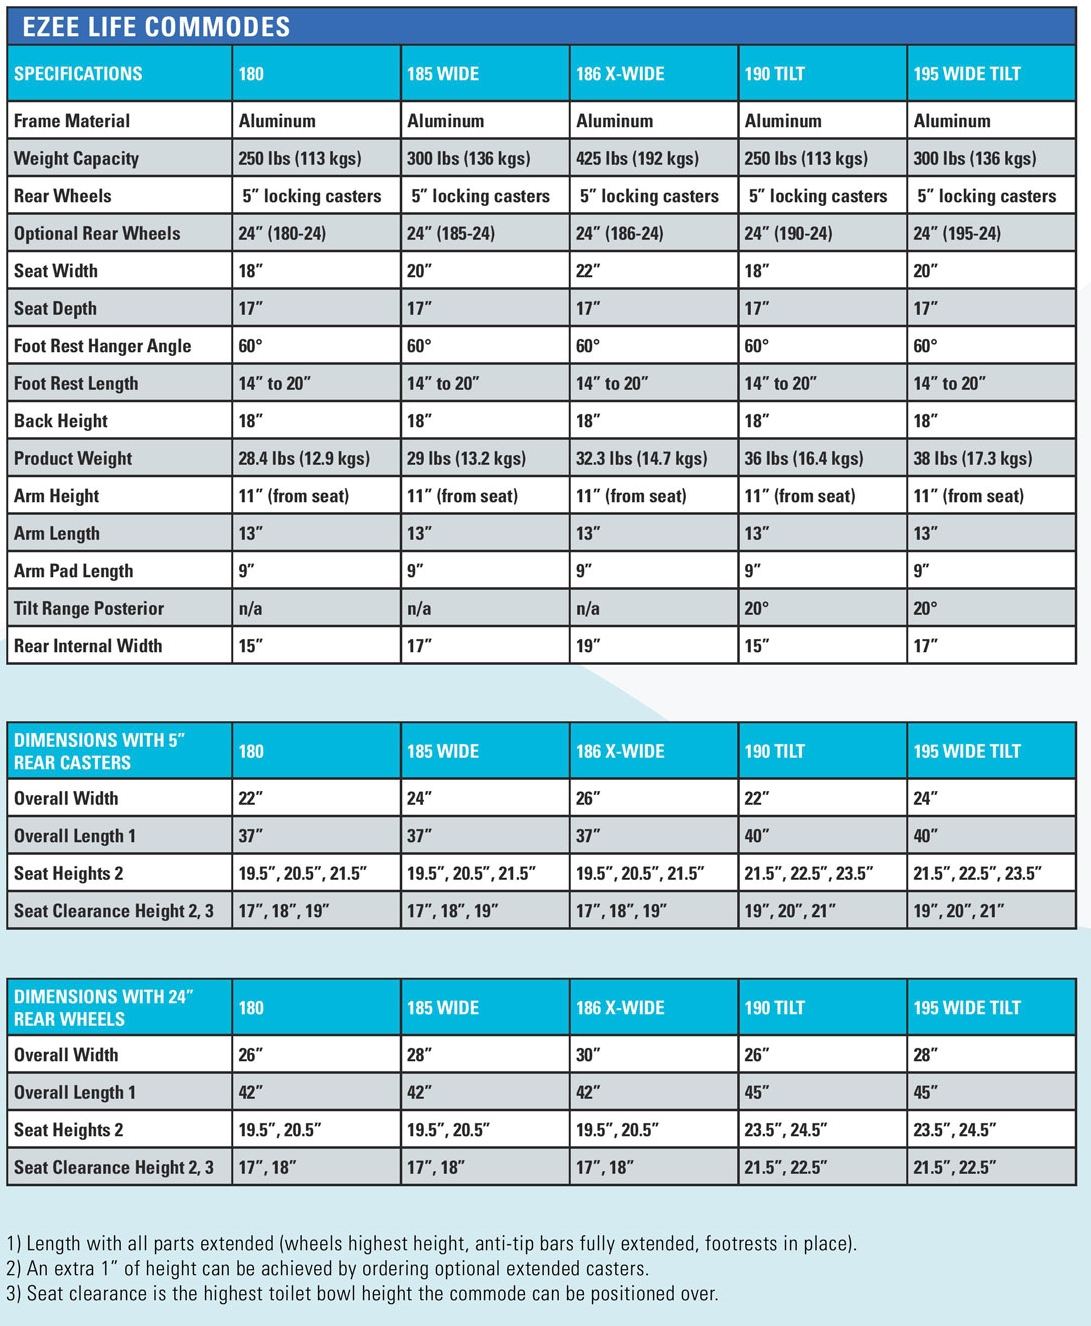 model-comparison-page.1.jpg